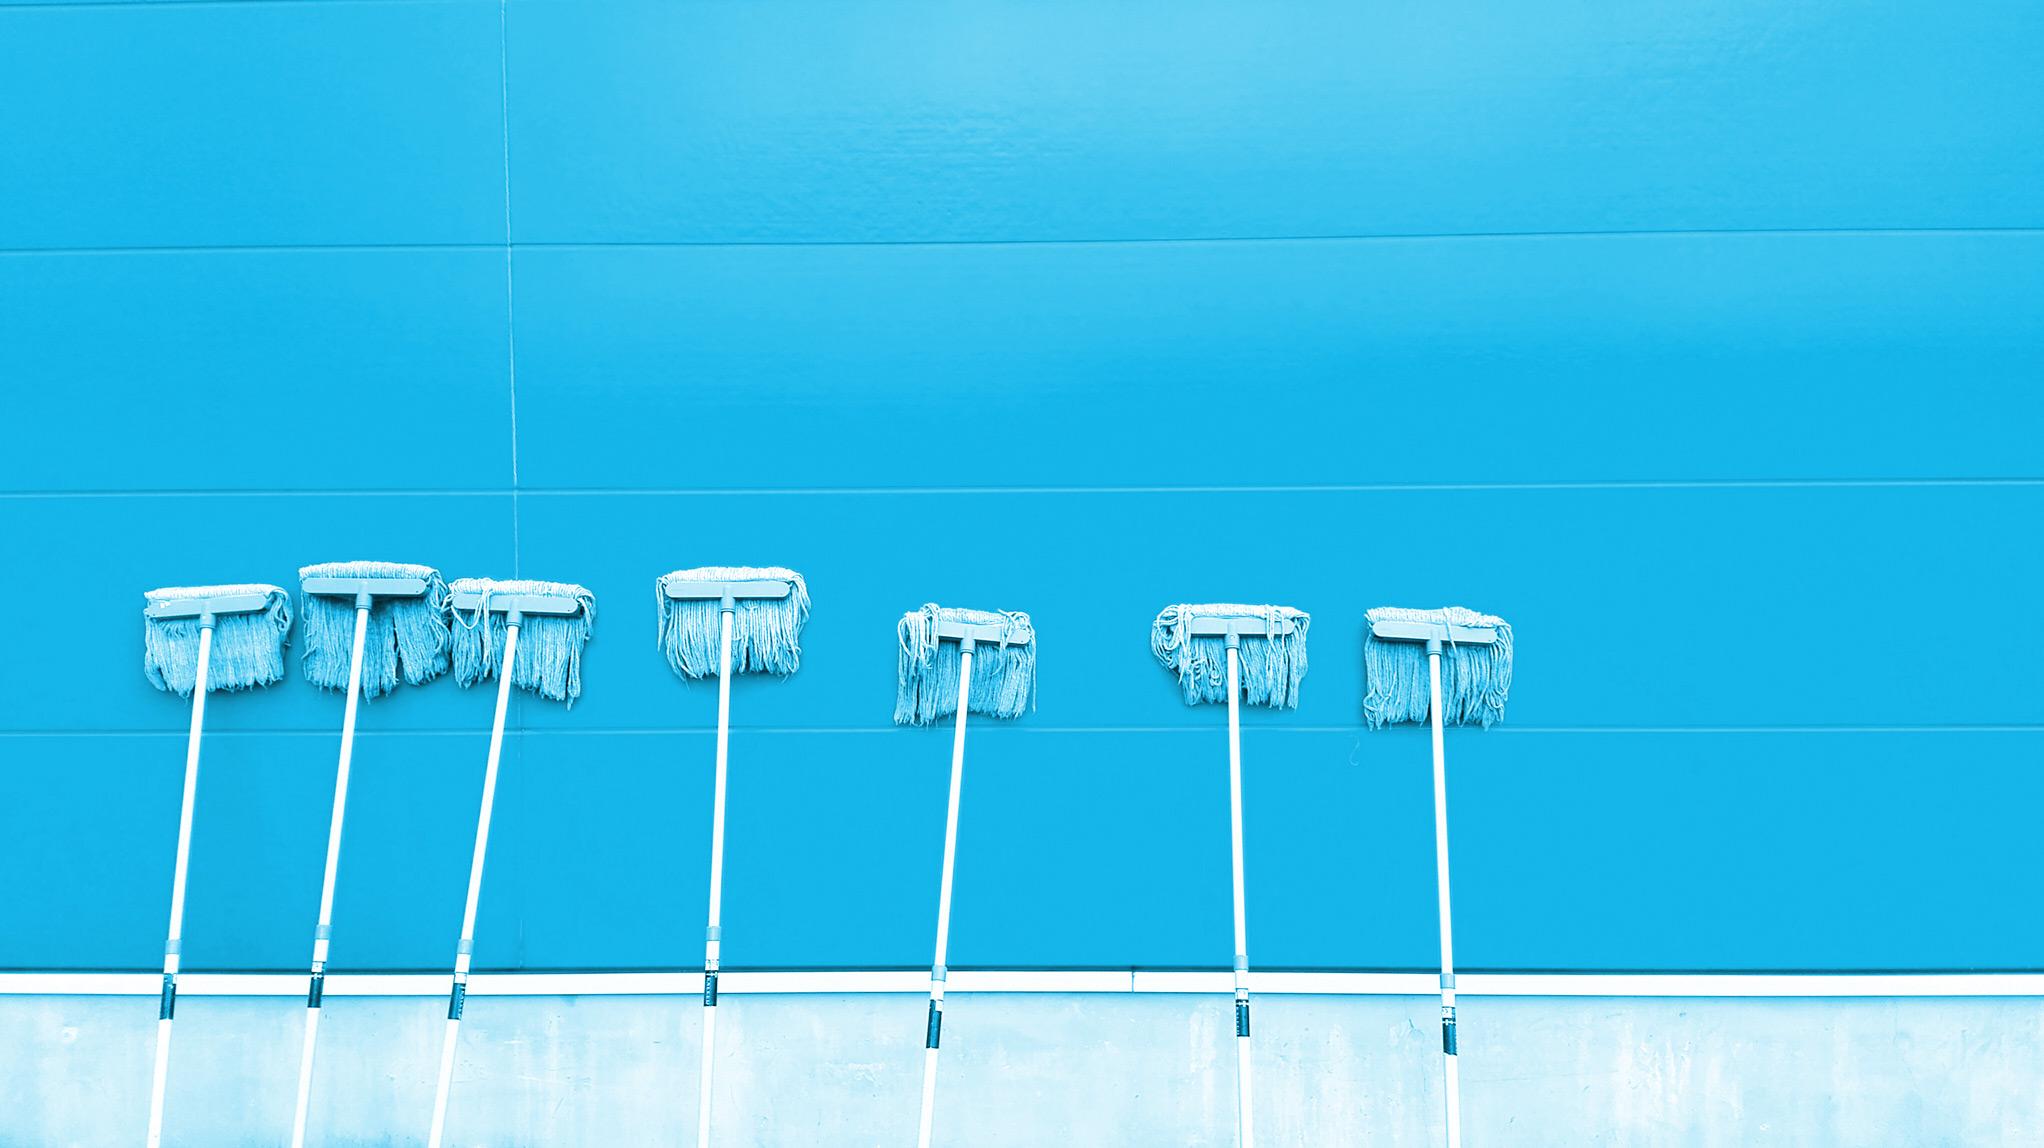 Komplexní servis v oblasti správy a údržby nemovitostí